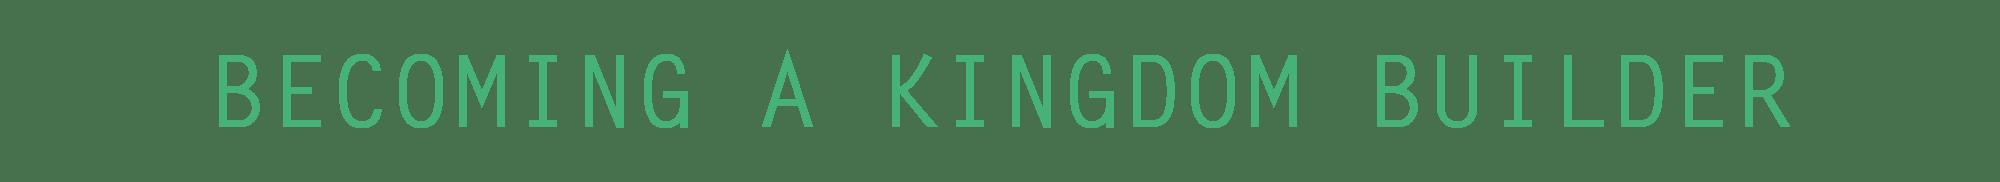 Becoming a Kingdom Builder